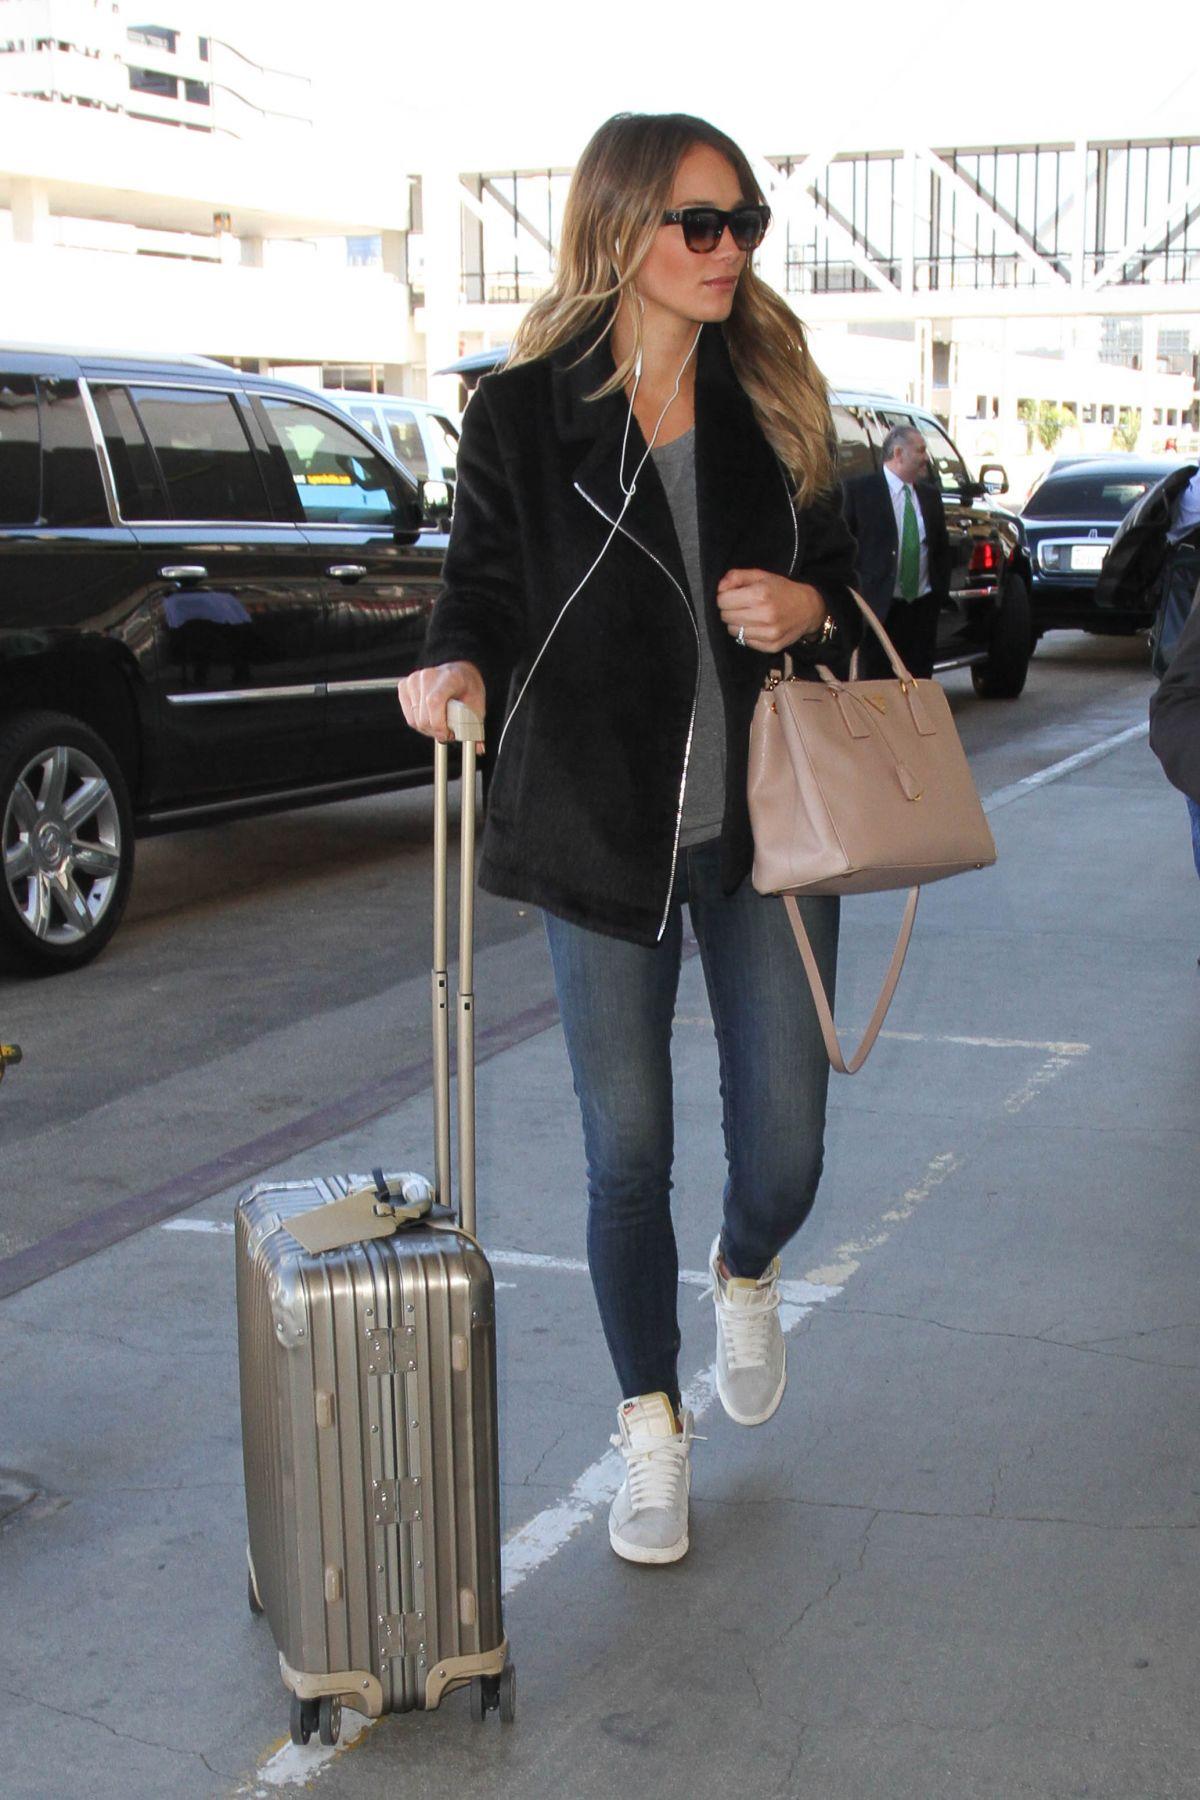 HANNAH DAVIS at LAX Airport in Los Angeles 11/12/2015